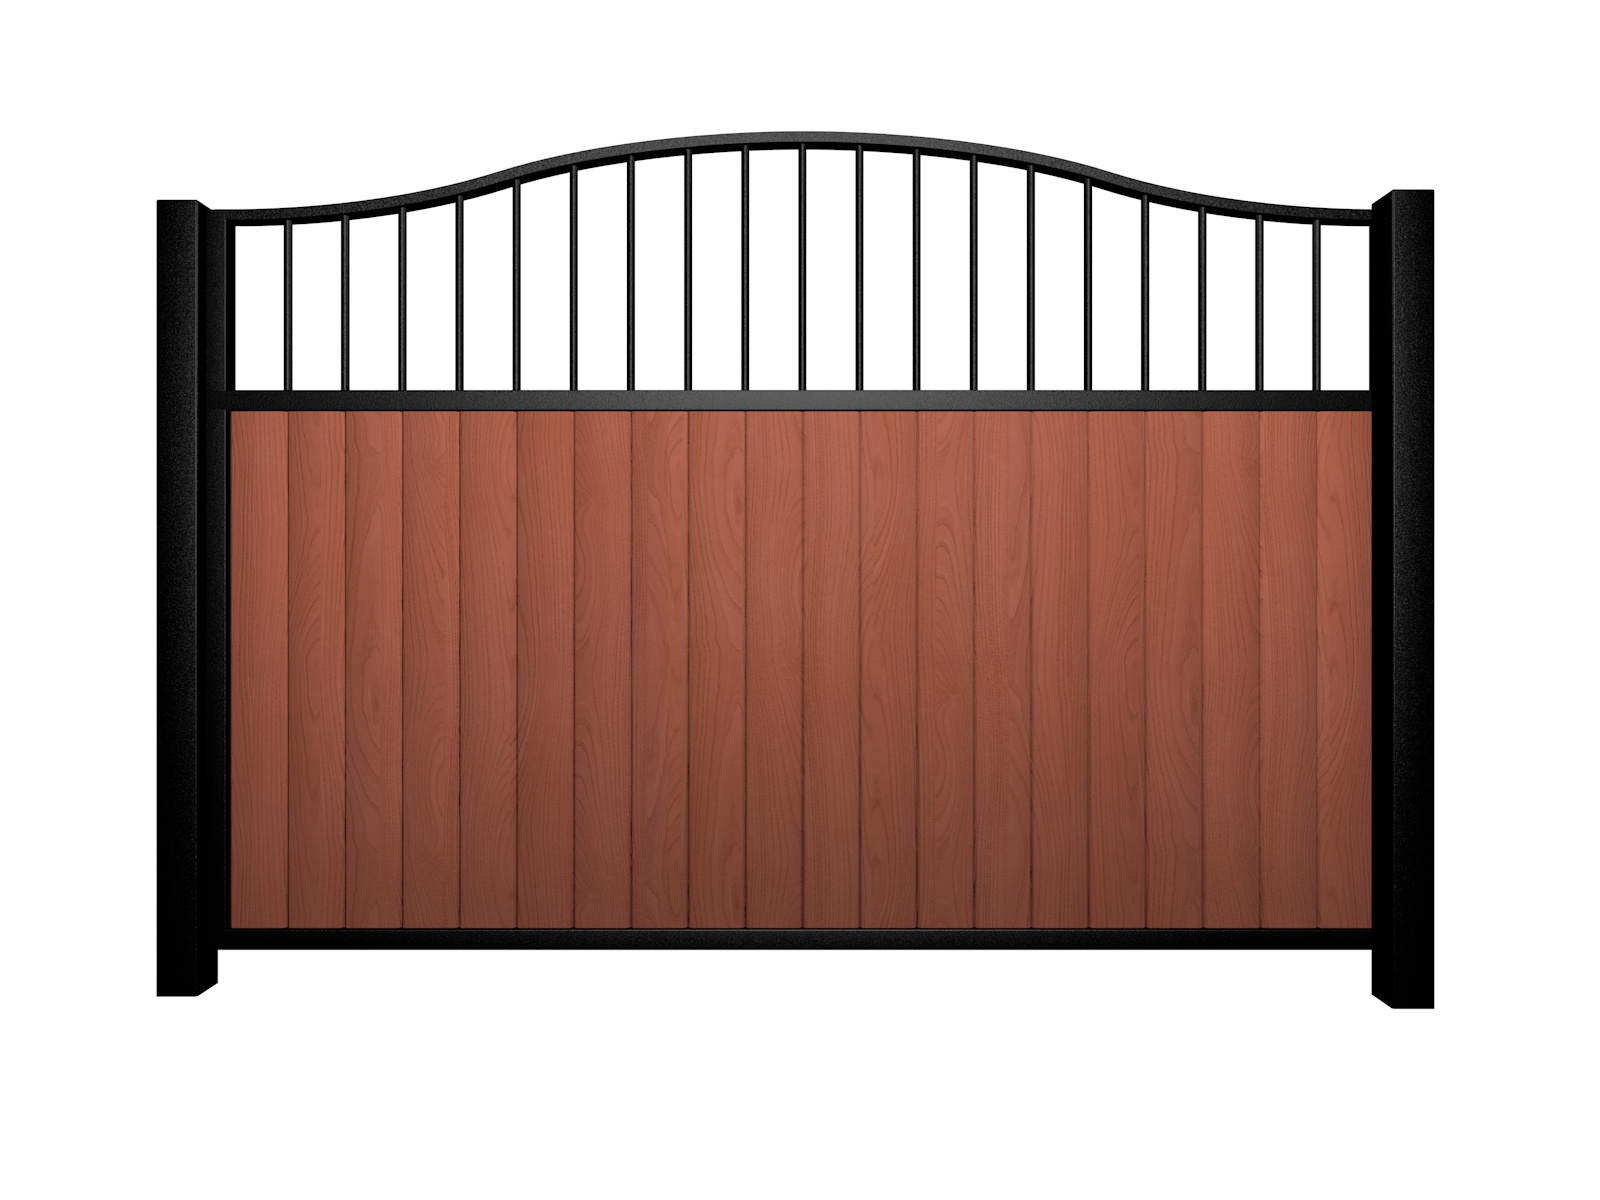 Sliding wood fill metal framed open bell top driveway gate bristol